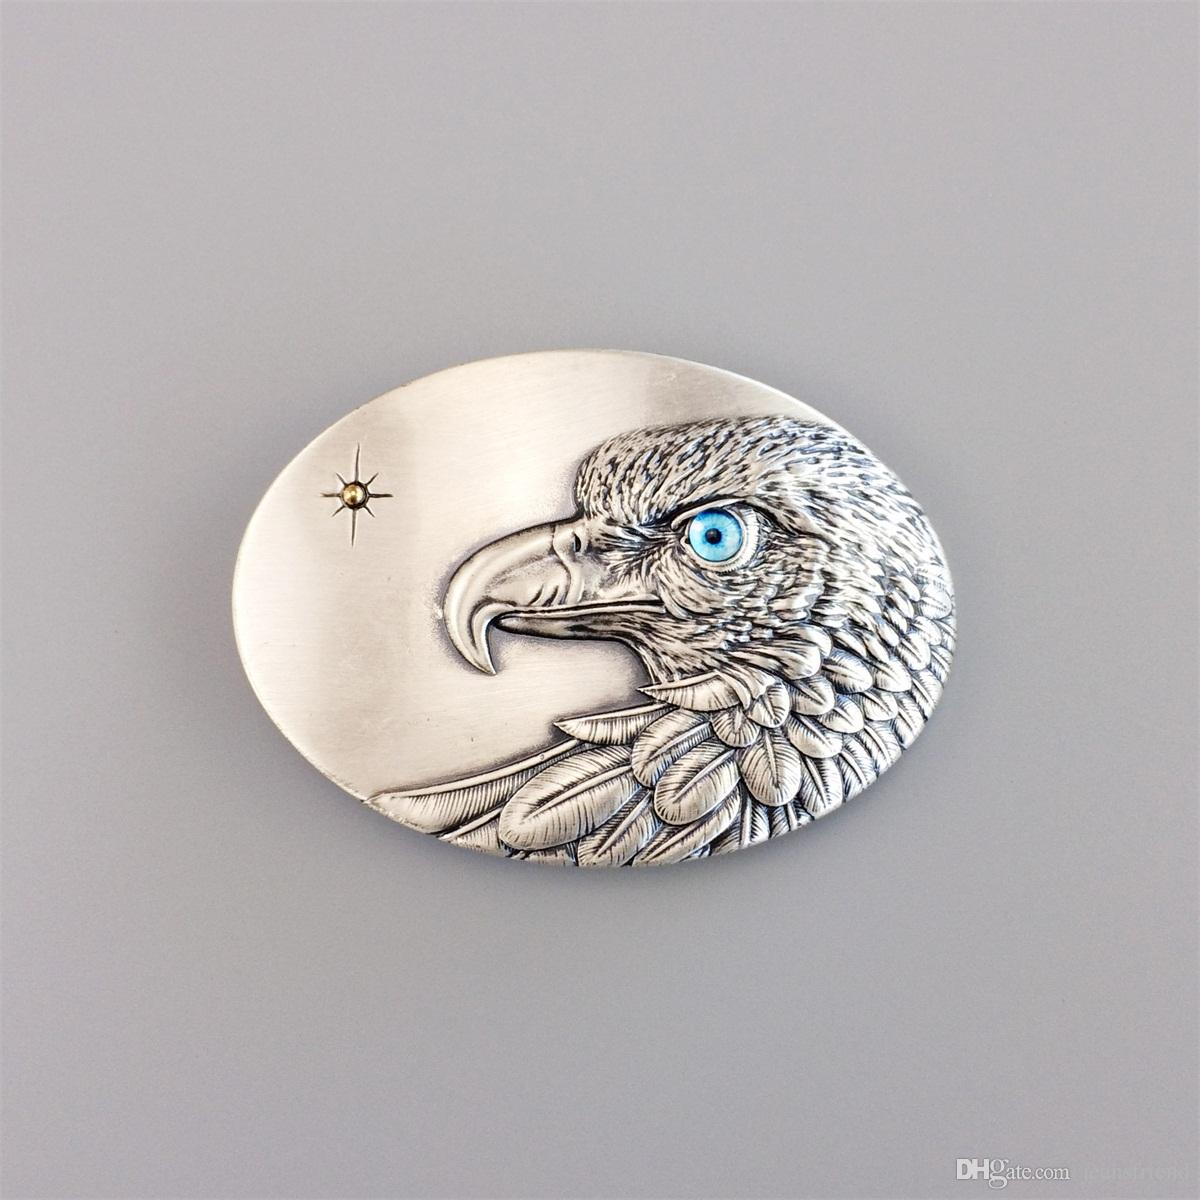 Männer Gürtelschnalle Original Vintage Silber vergoldet Oval Sun Eagle Blue Eye Gürtelschnalle Gürtelschnalle Boucle de ceinture SCHNALLE-WT149SL-BL